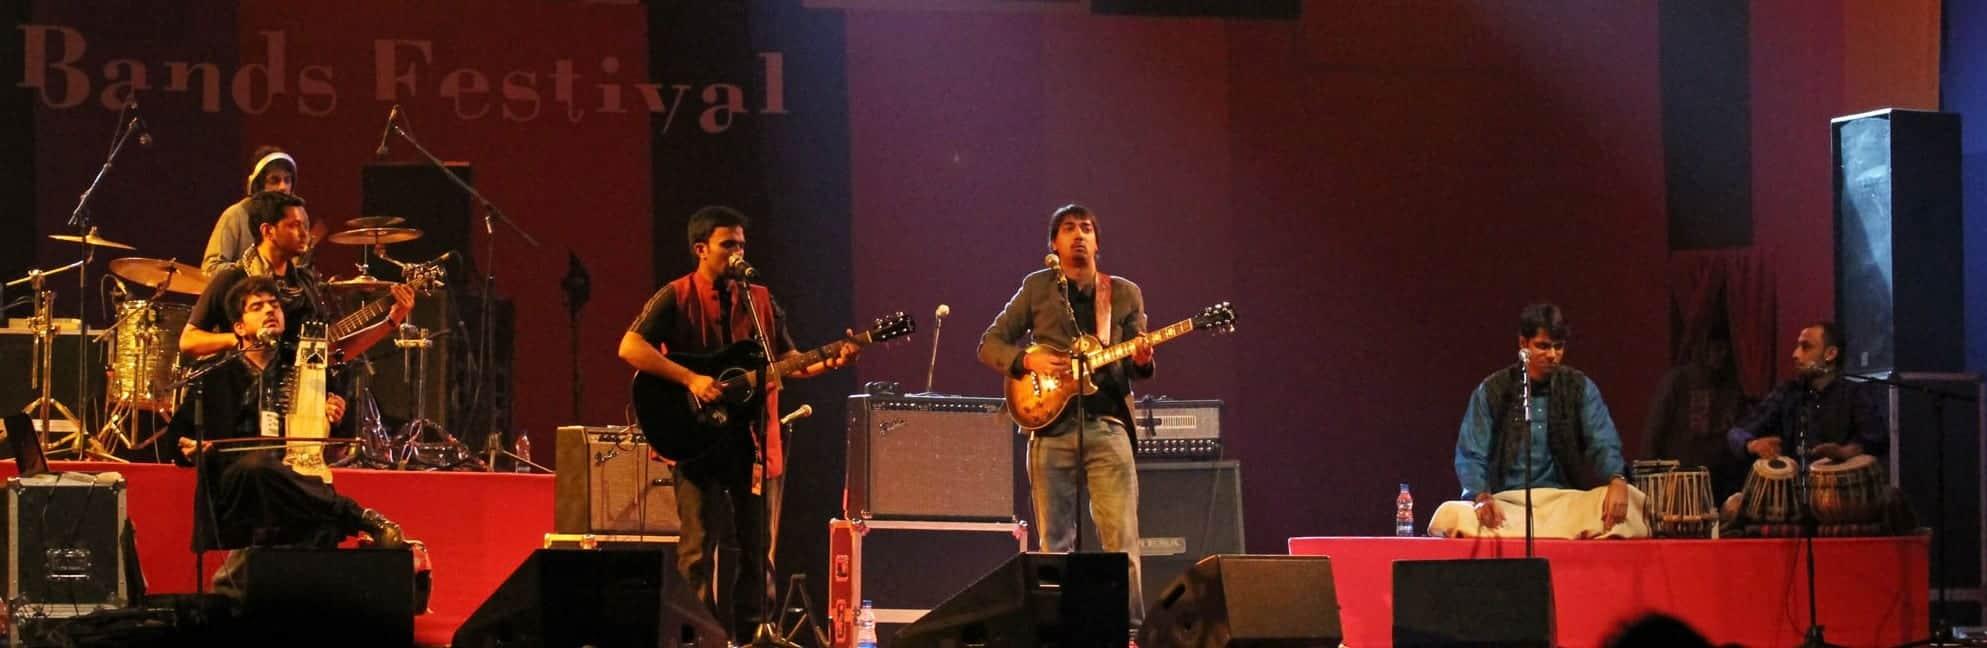 Advaita (New Delhi) during their performance 1 Photo Credit- Ajay Lal